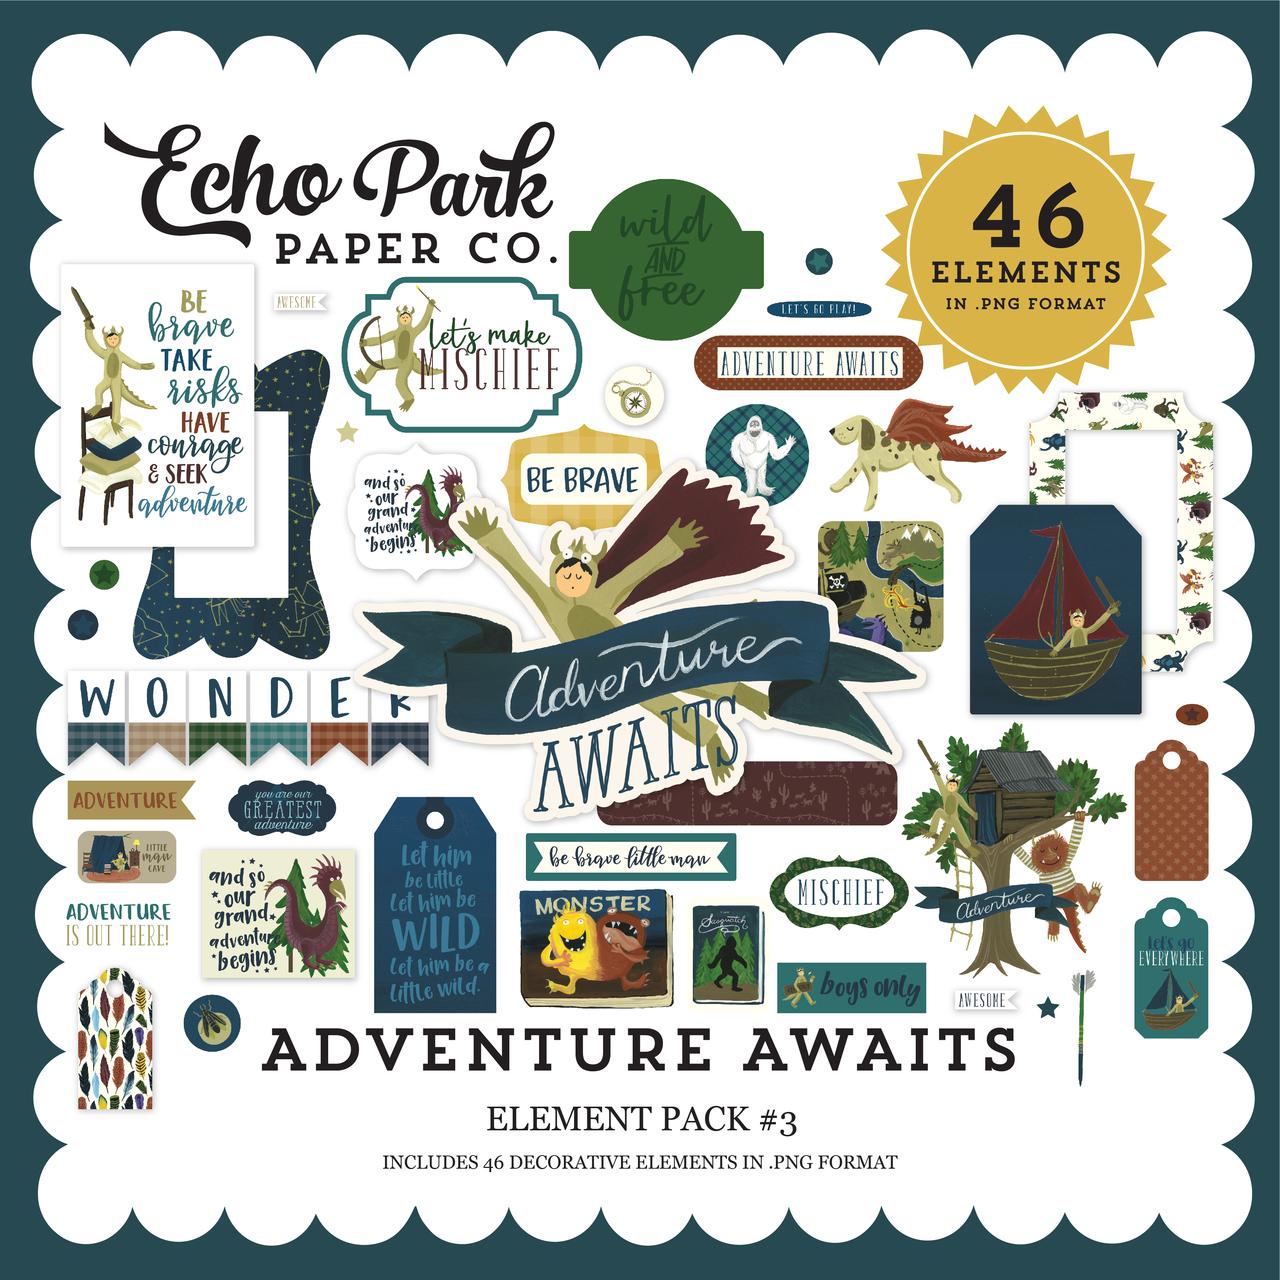 Adventure Awaits Element Pack #3